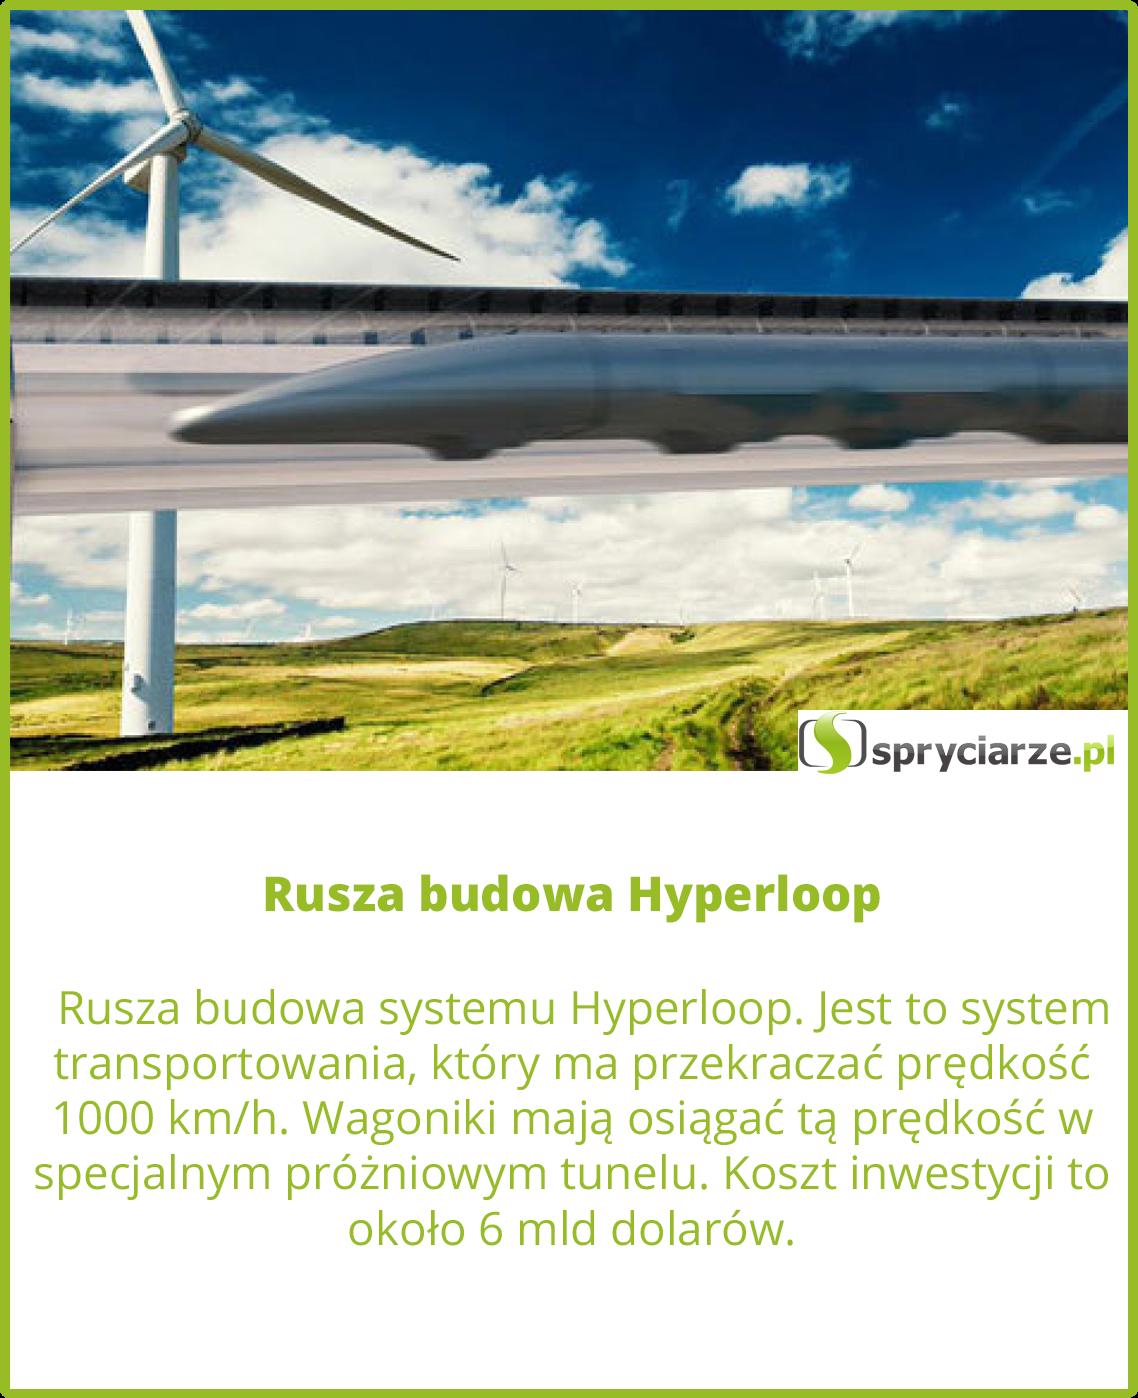 Rusza budowa Hyperloop